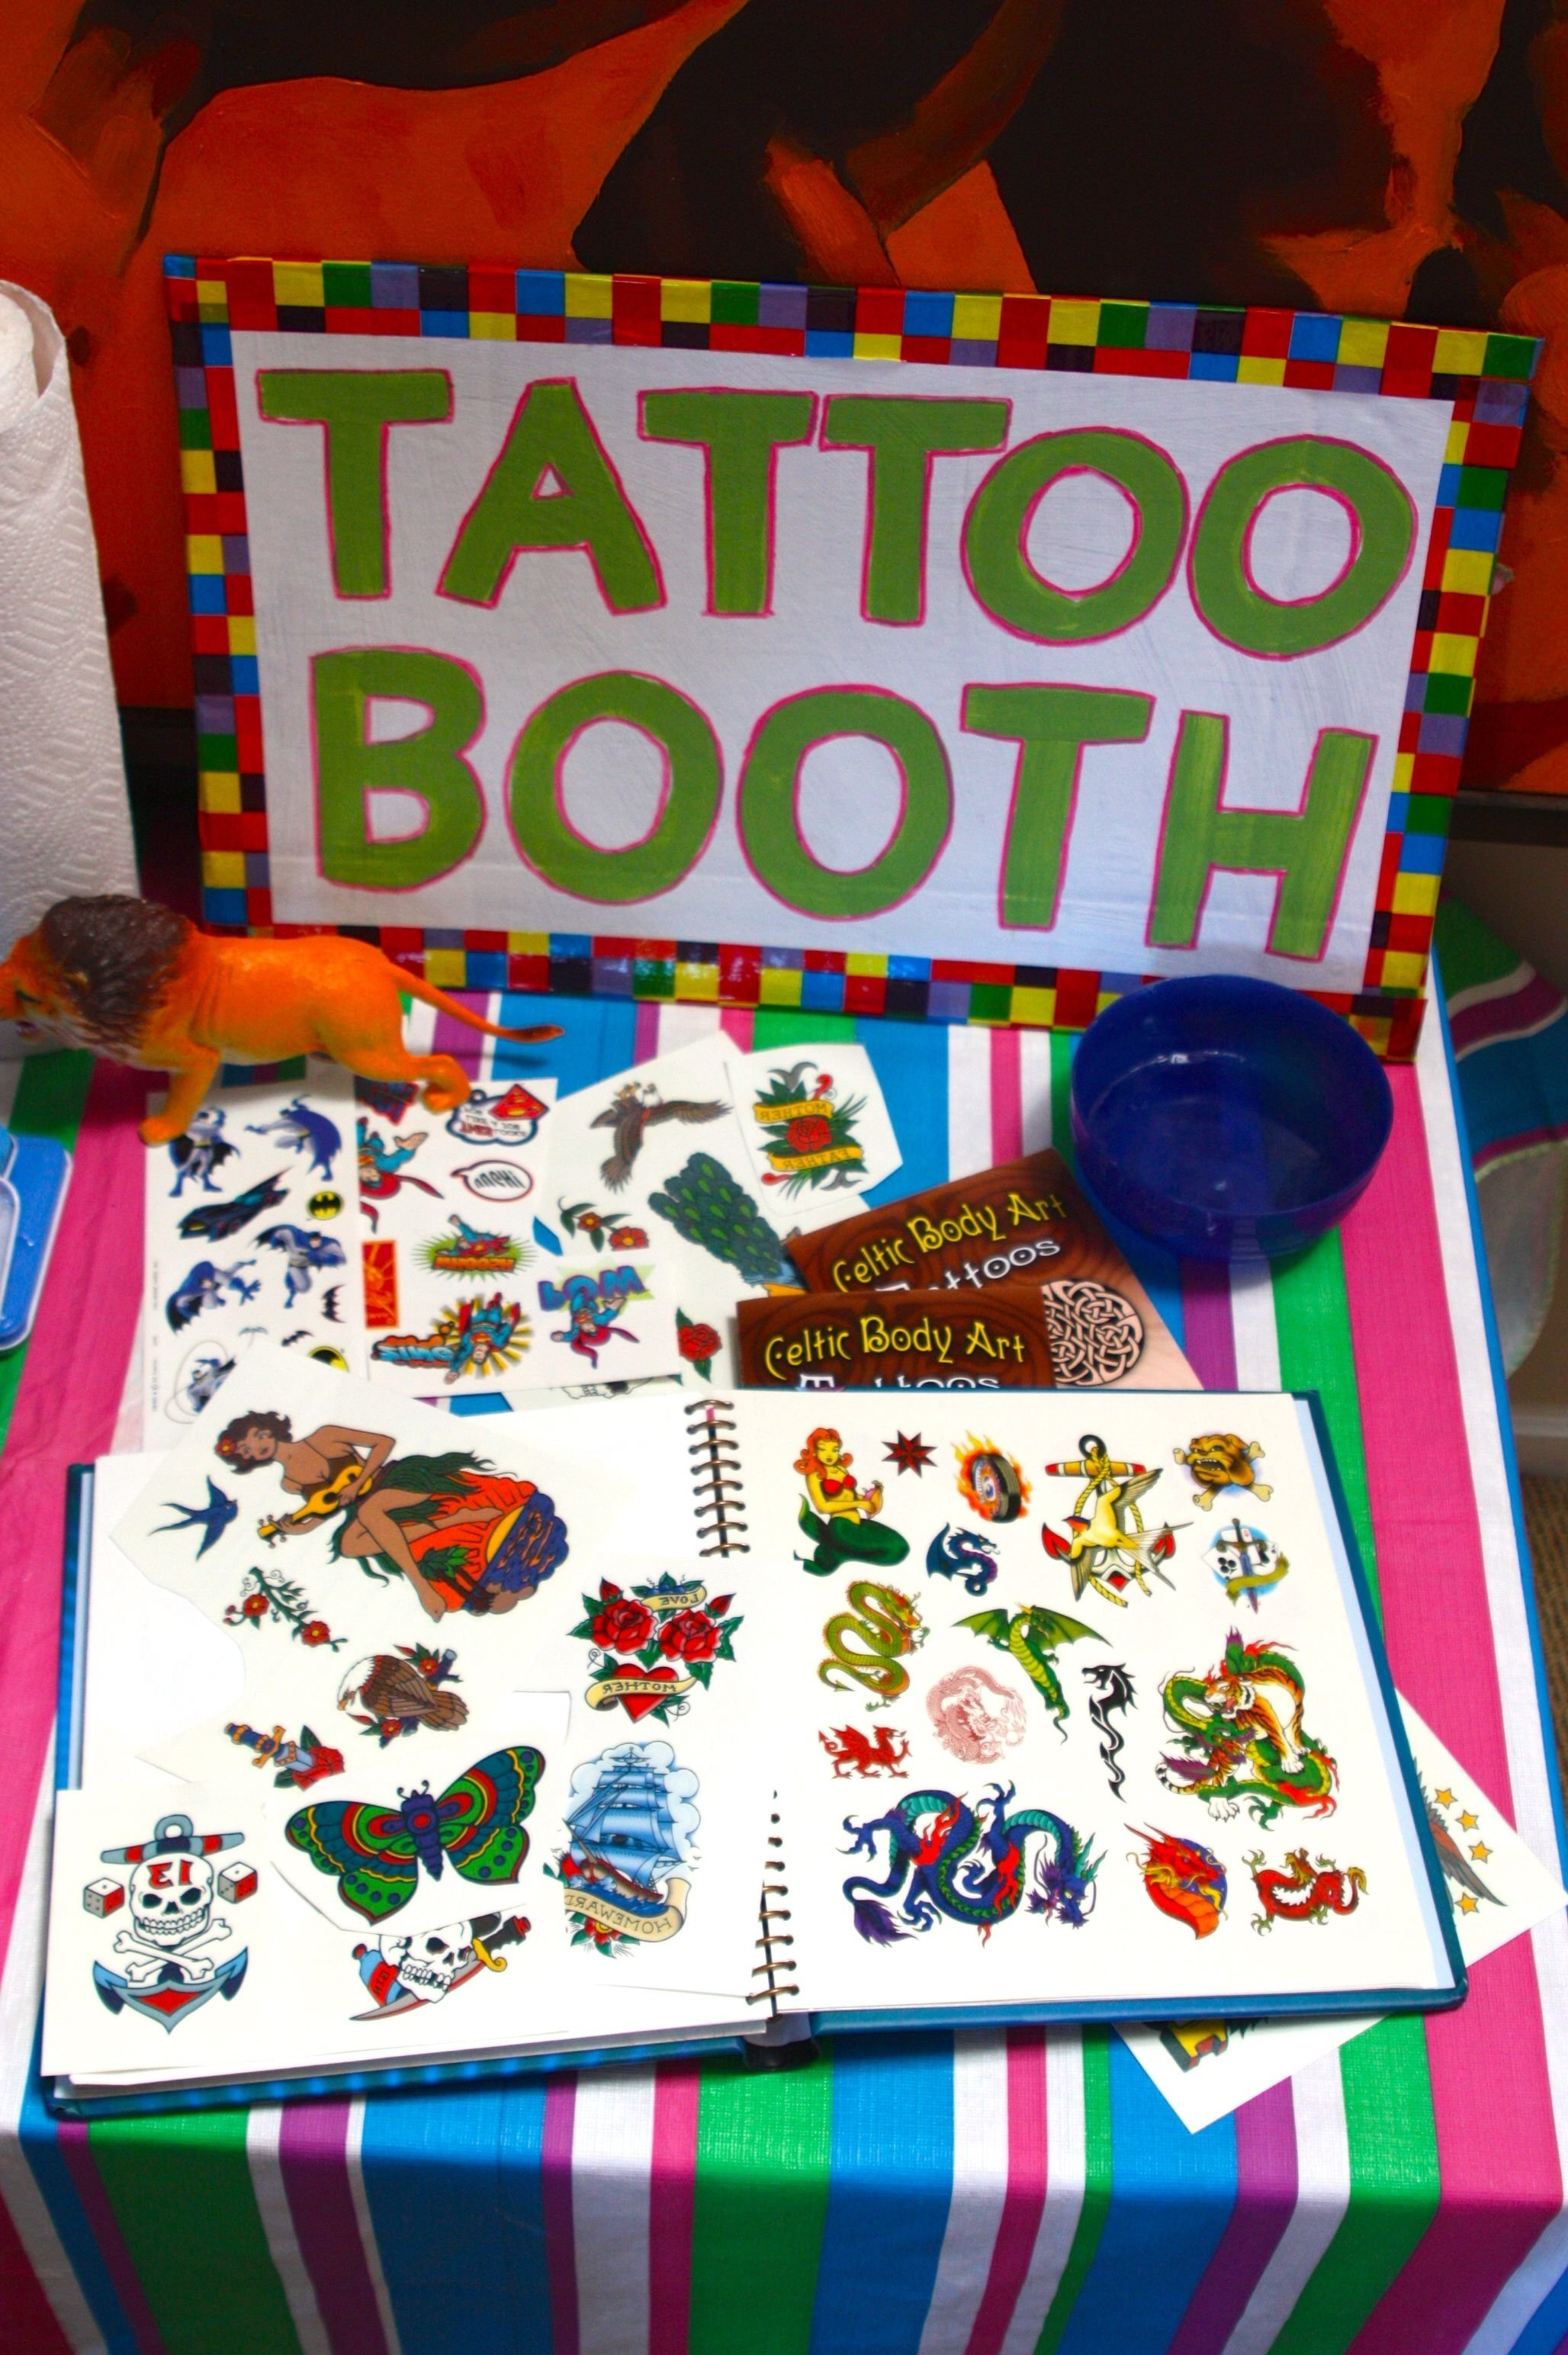 10 Gorgeous Halloween Party Ideas For Toddlers f09f8e88 fiestas infantiles f09f8e82 91 ideas de cumpleanos f09f8e81 tattoo 2 2020